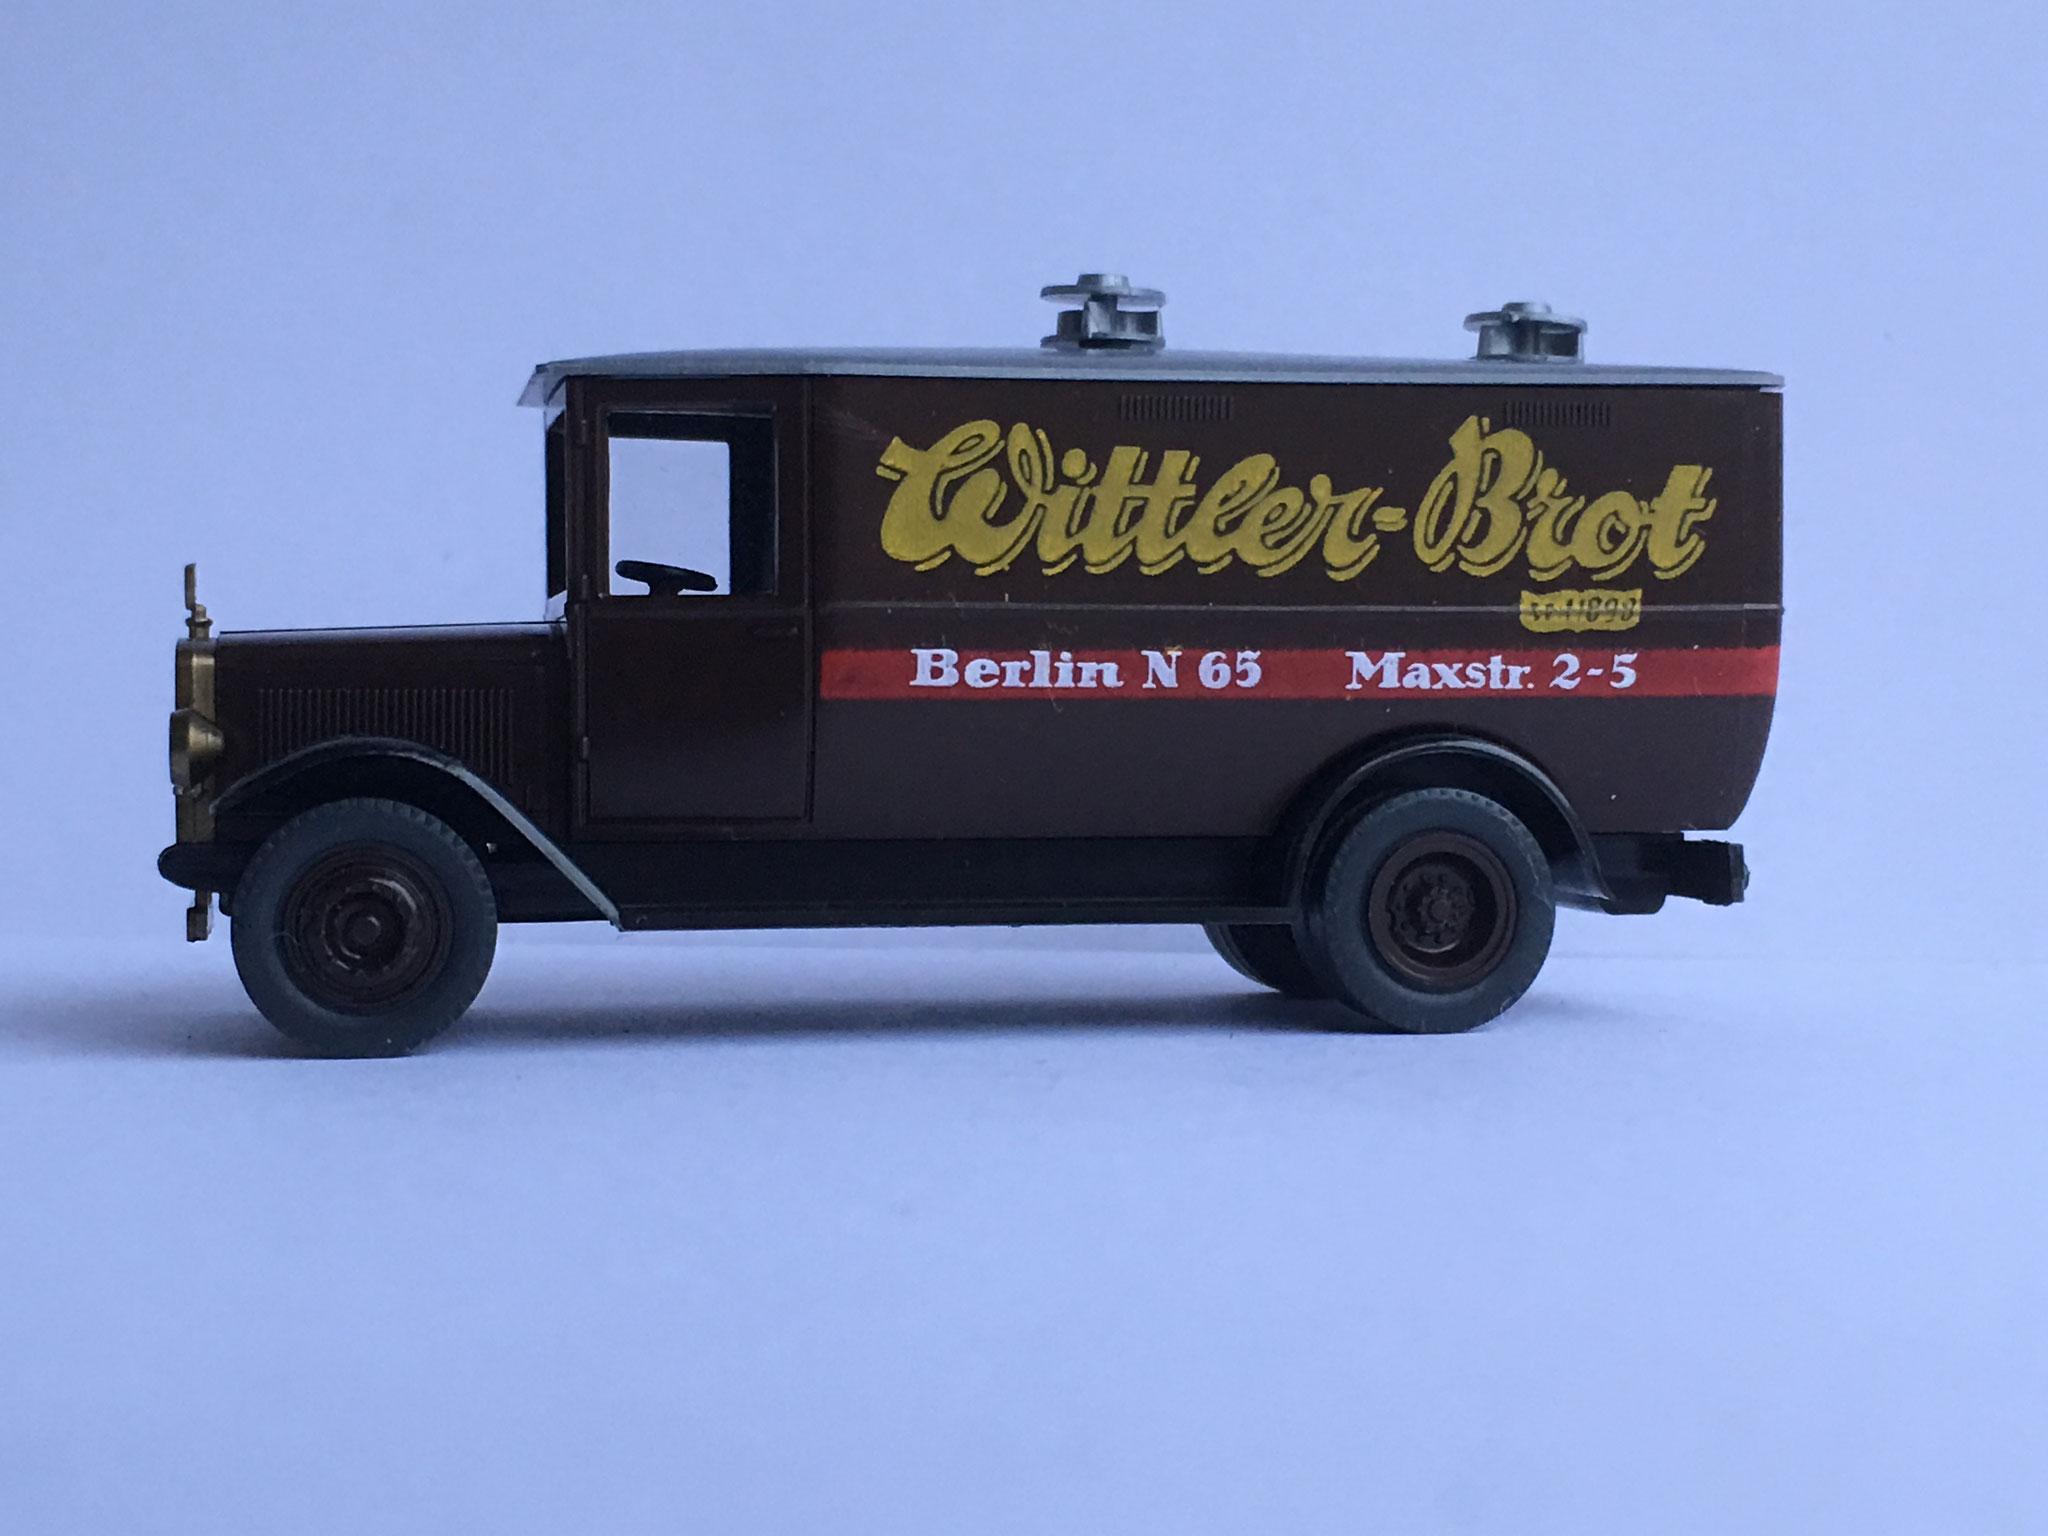 Mercedes L2 Kastenwagen Wittler Brot Berlin, Art. Nr. R6 (Pietsch), 1989